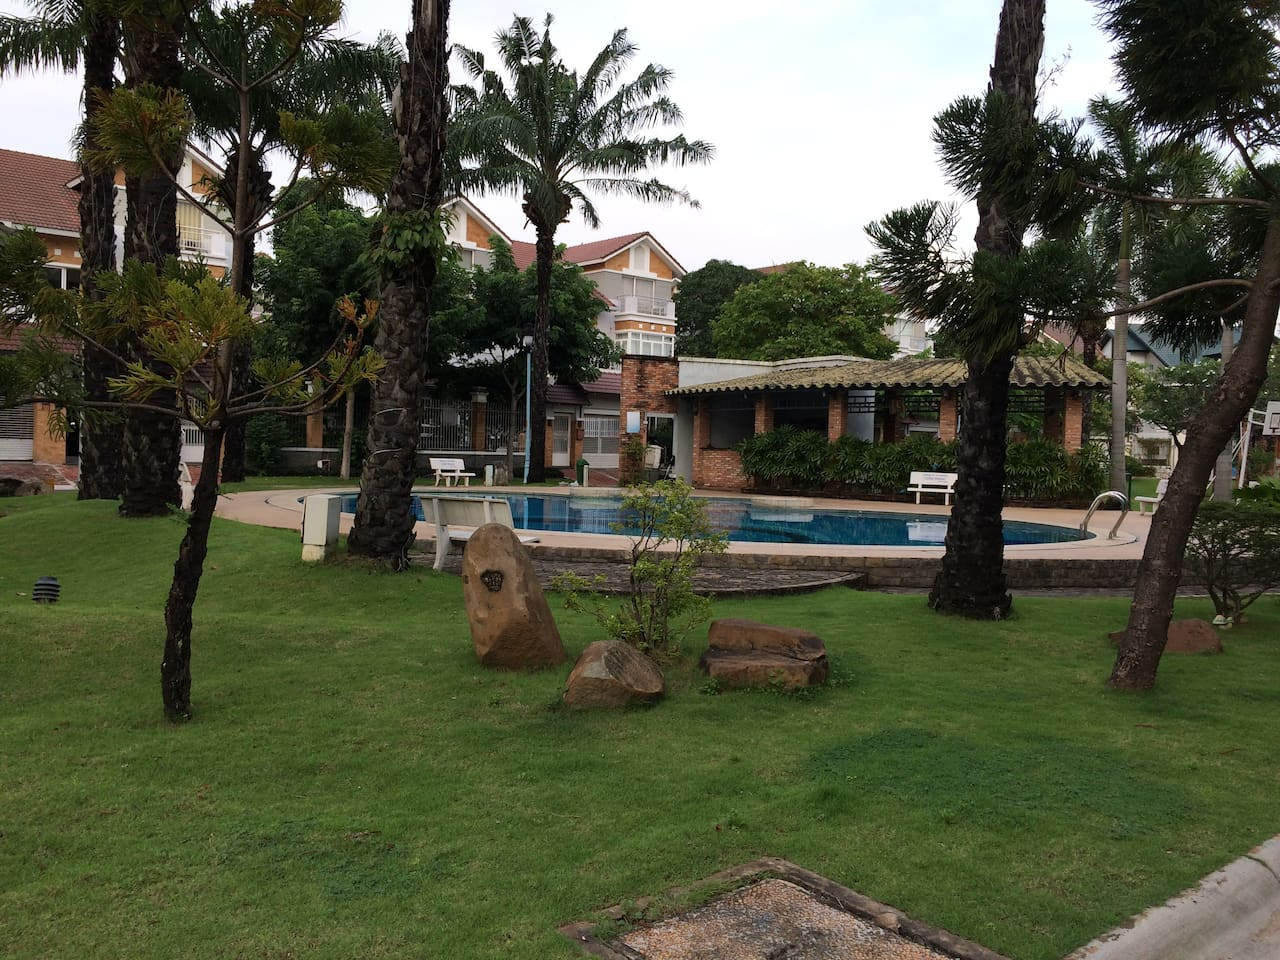 Nam Phu villas - garden and swimming pool